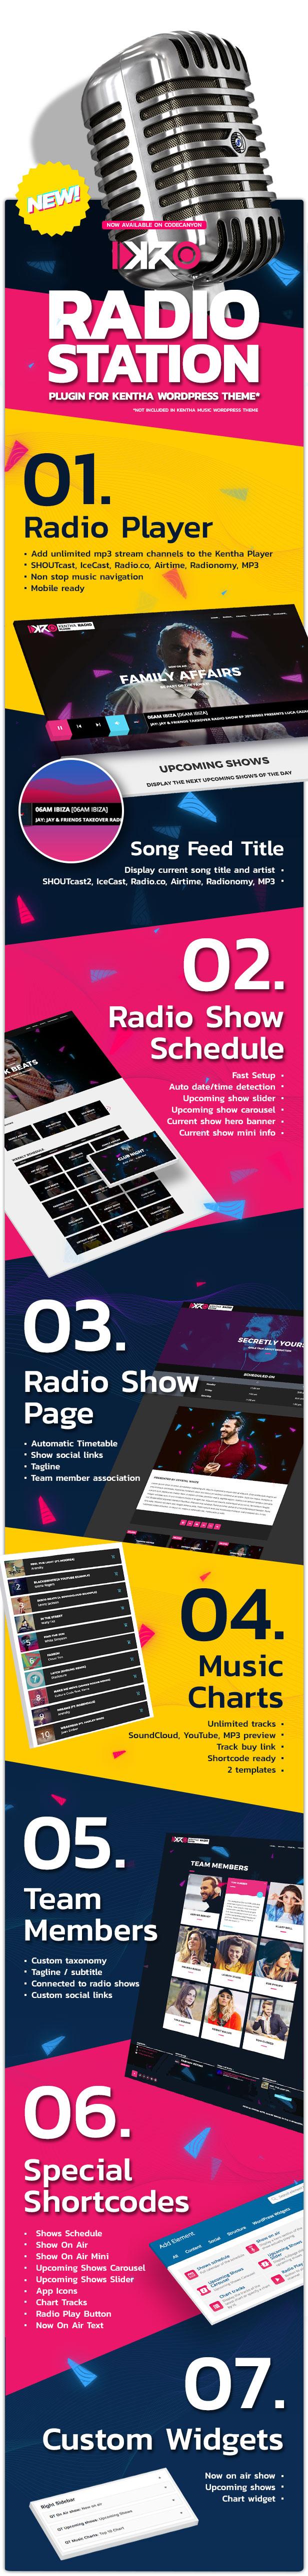 KenthaRadio - Addon for Kentha Music WordPress Theme To Add Radio Station and Schedule Functionality - 5